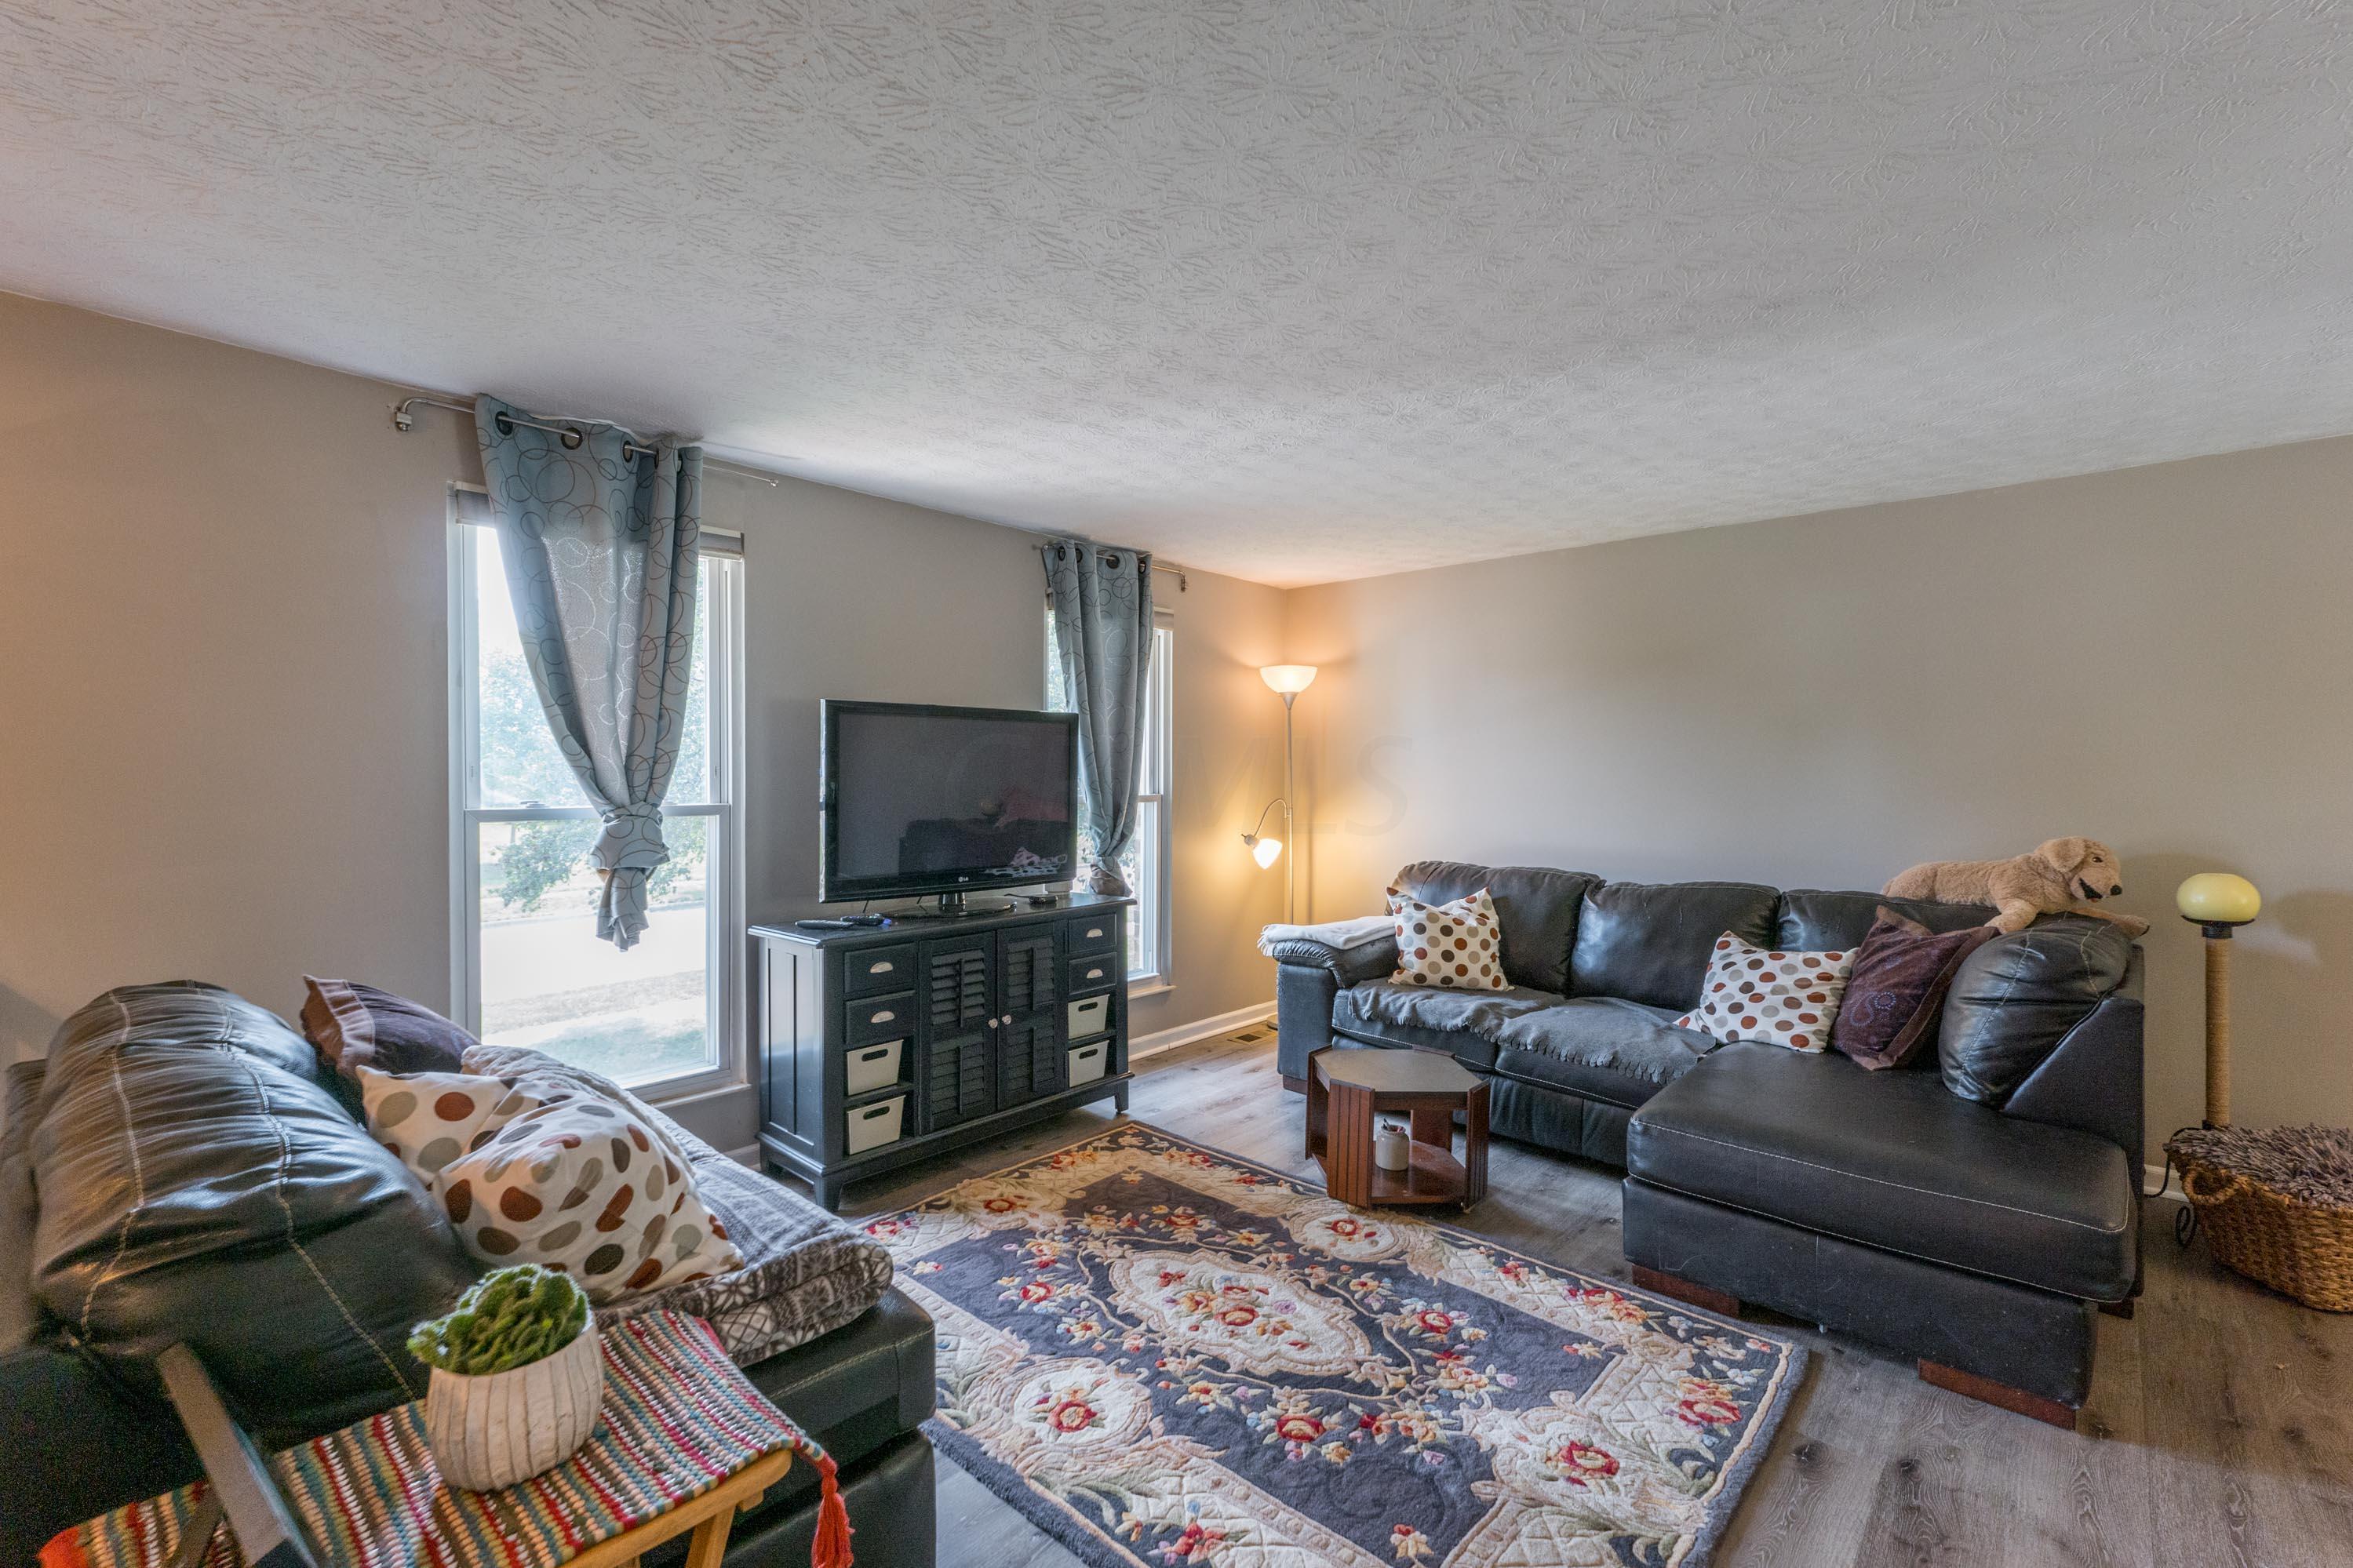 6245 Rockland Drive, Dublin, Ohio 43017, 3 Bedrooms Bedrooms, ,3 BathroomsBathrooms,Residential,For Sale,Rockland,220031273